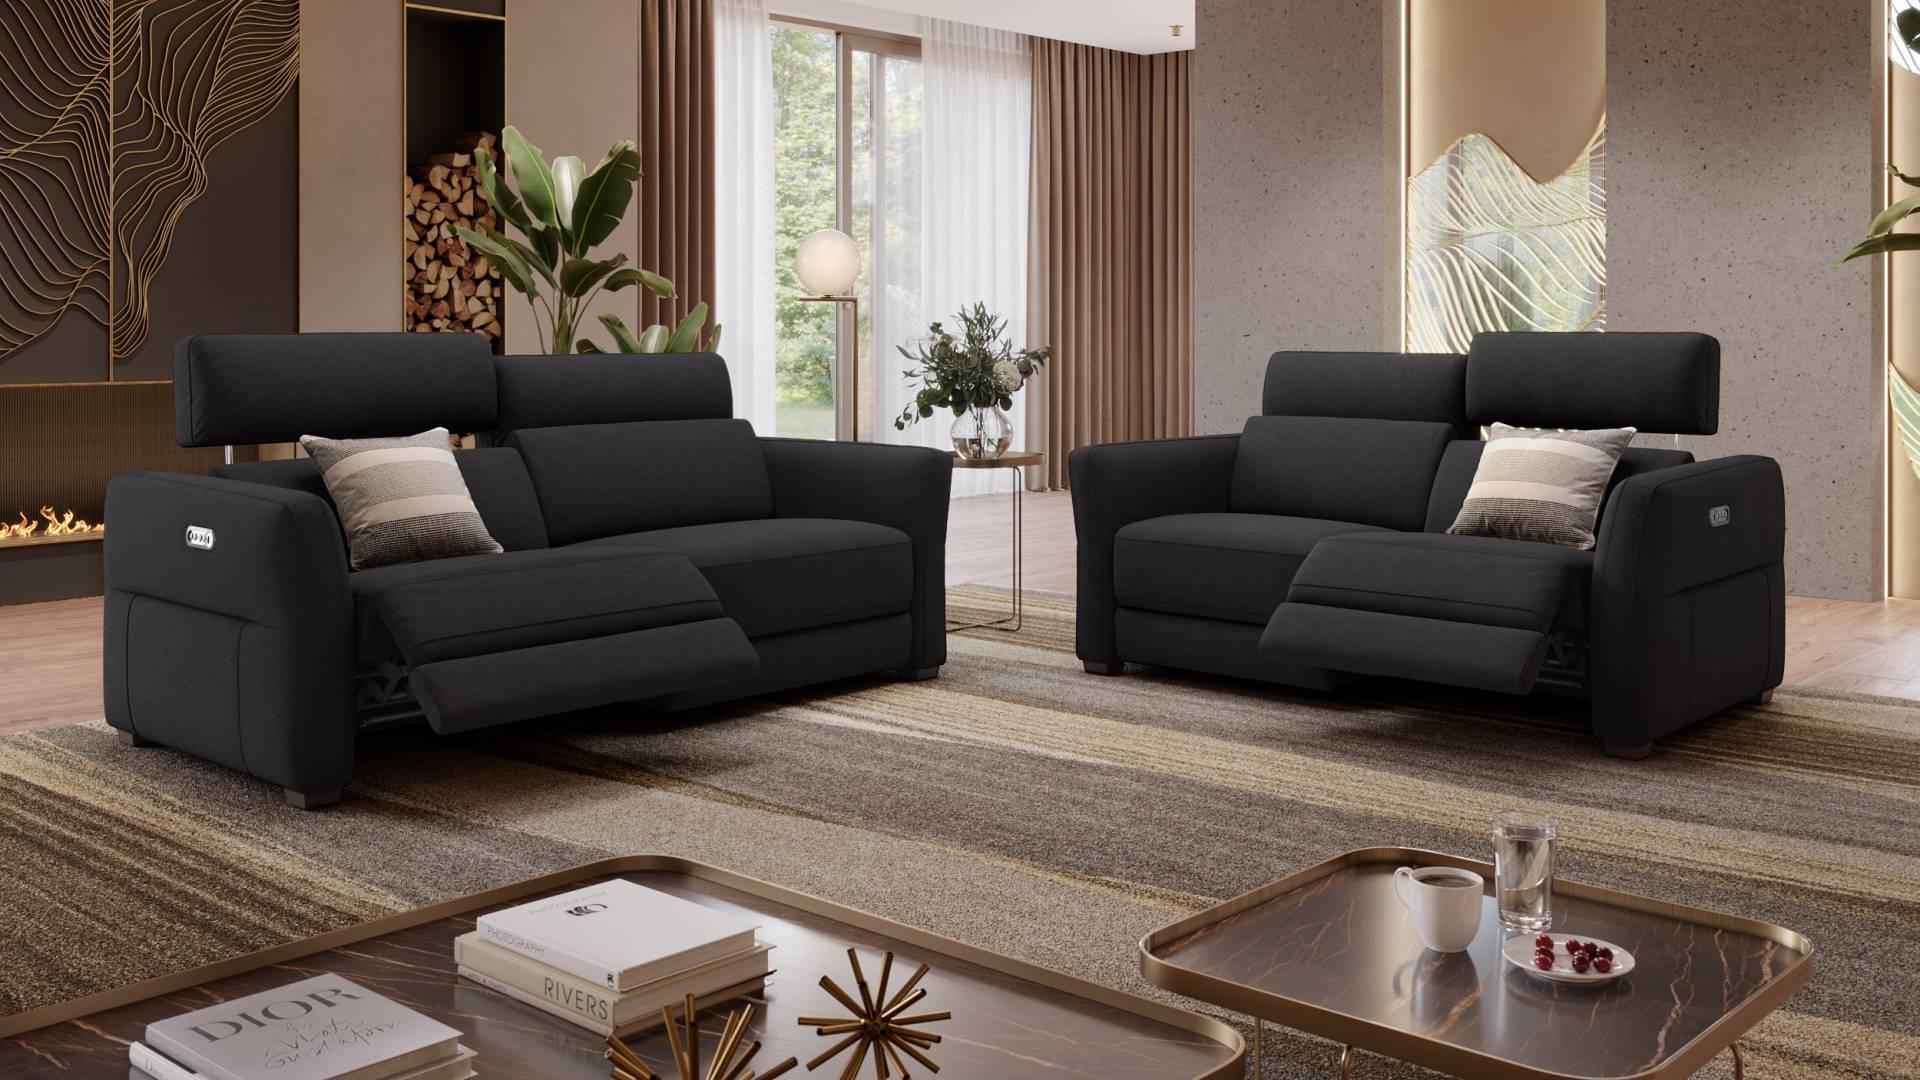 Zweier Stoffsofa Novara   Couch mit Relaxfunktion   Sofanella